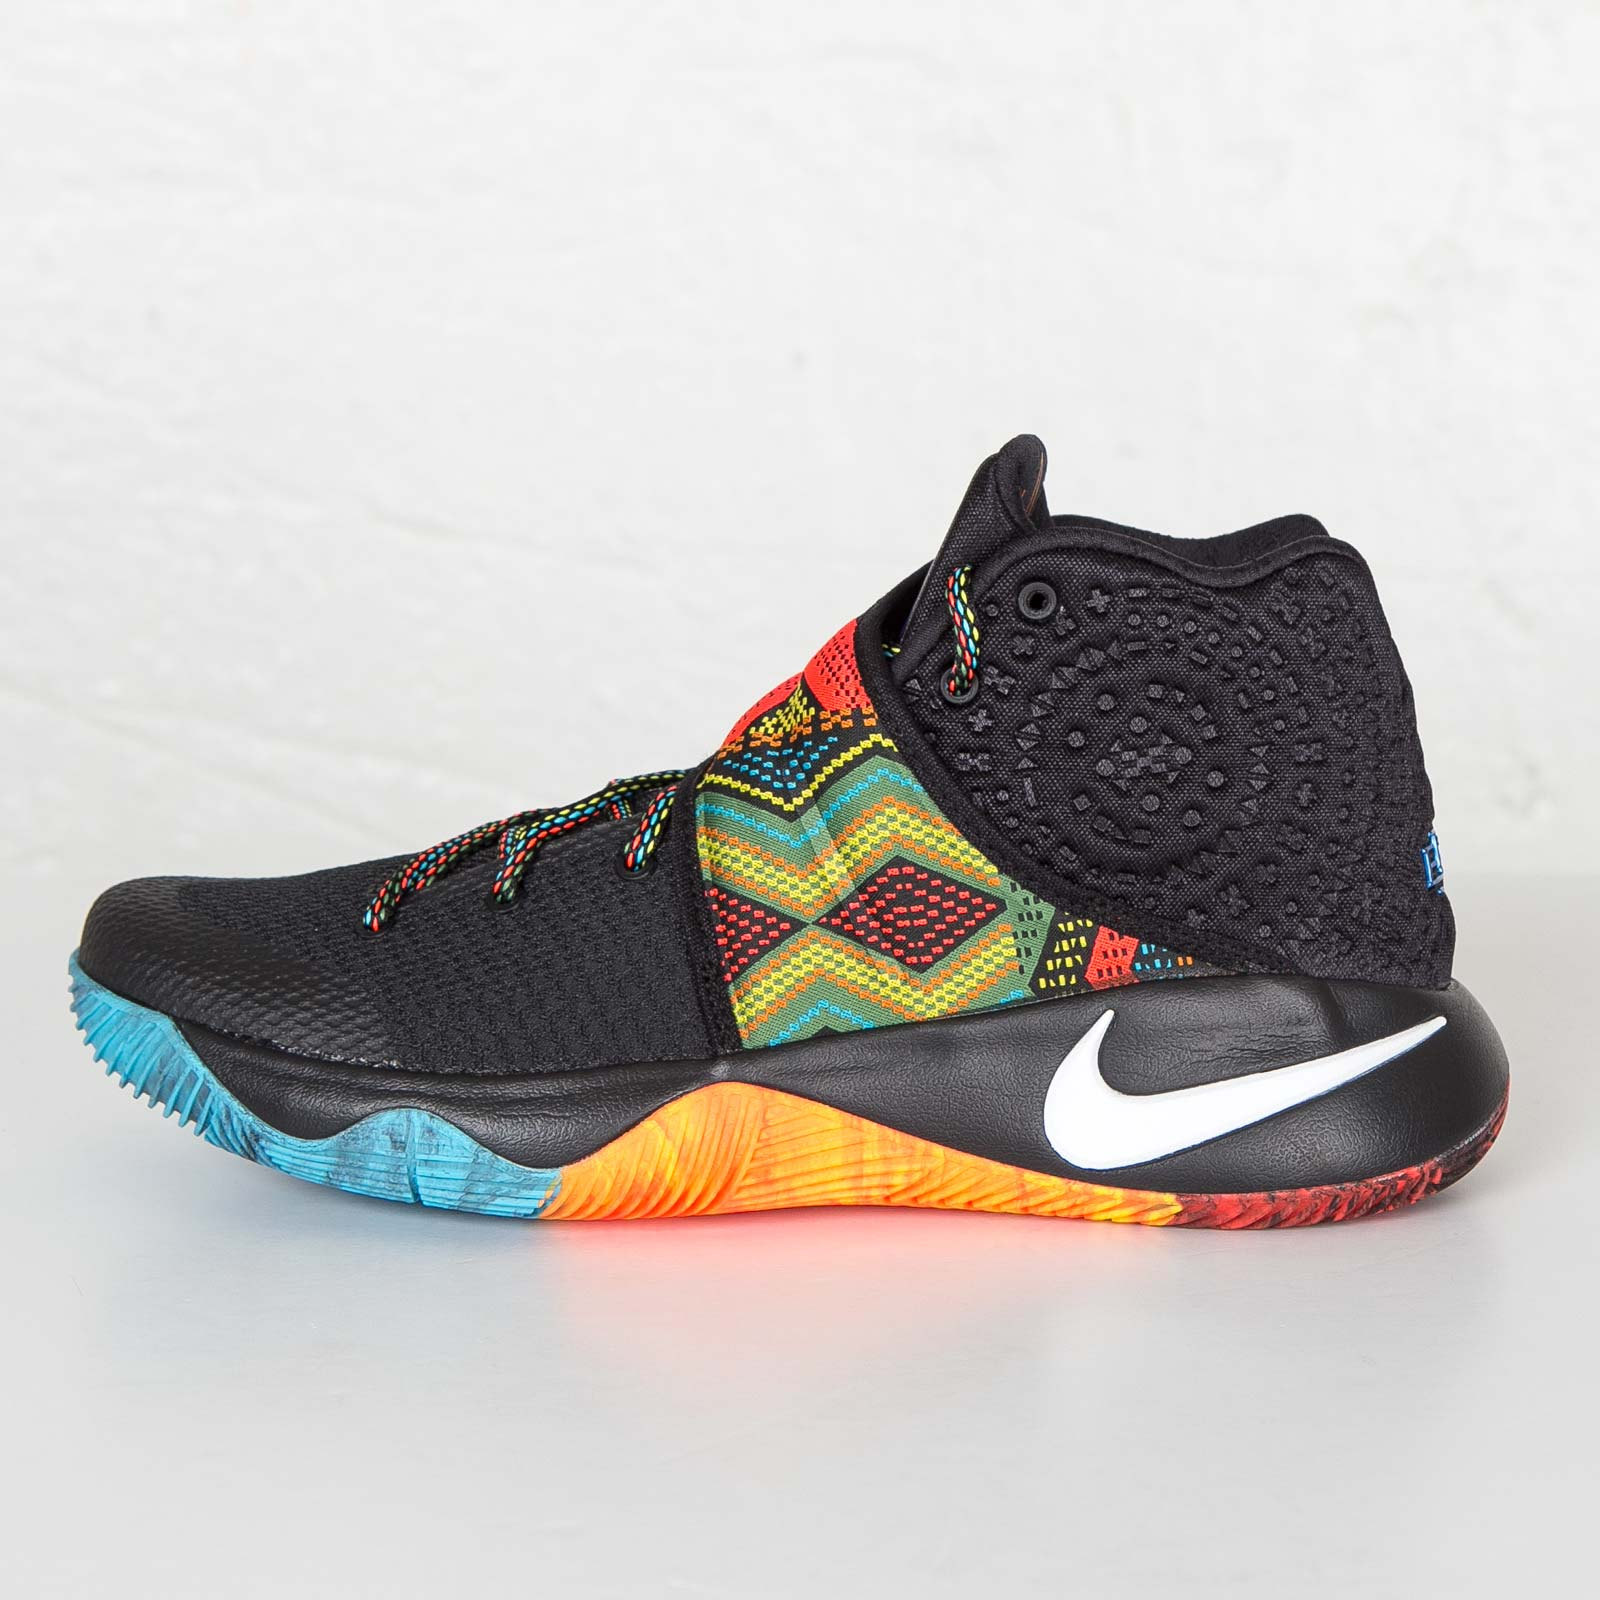 06addaa91b0 Nike Kyrie 2 BHM - 828375-099 - Sneakersnstuff